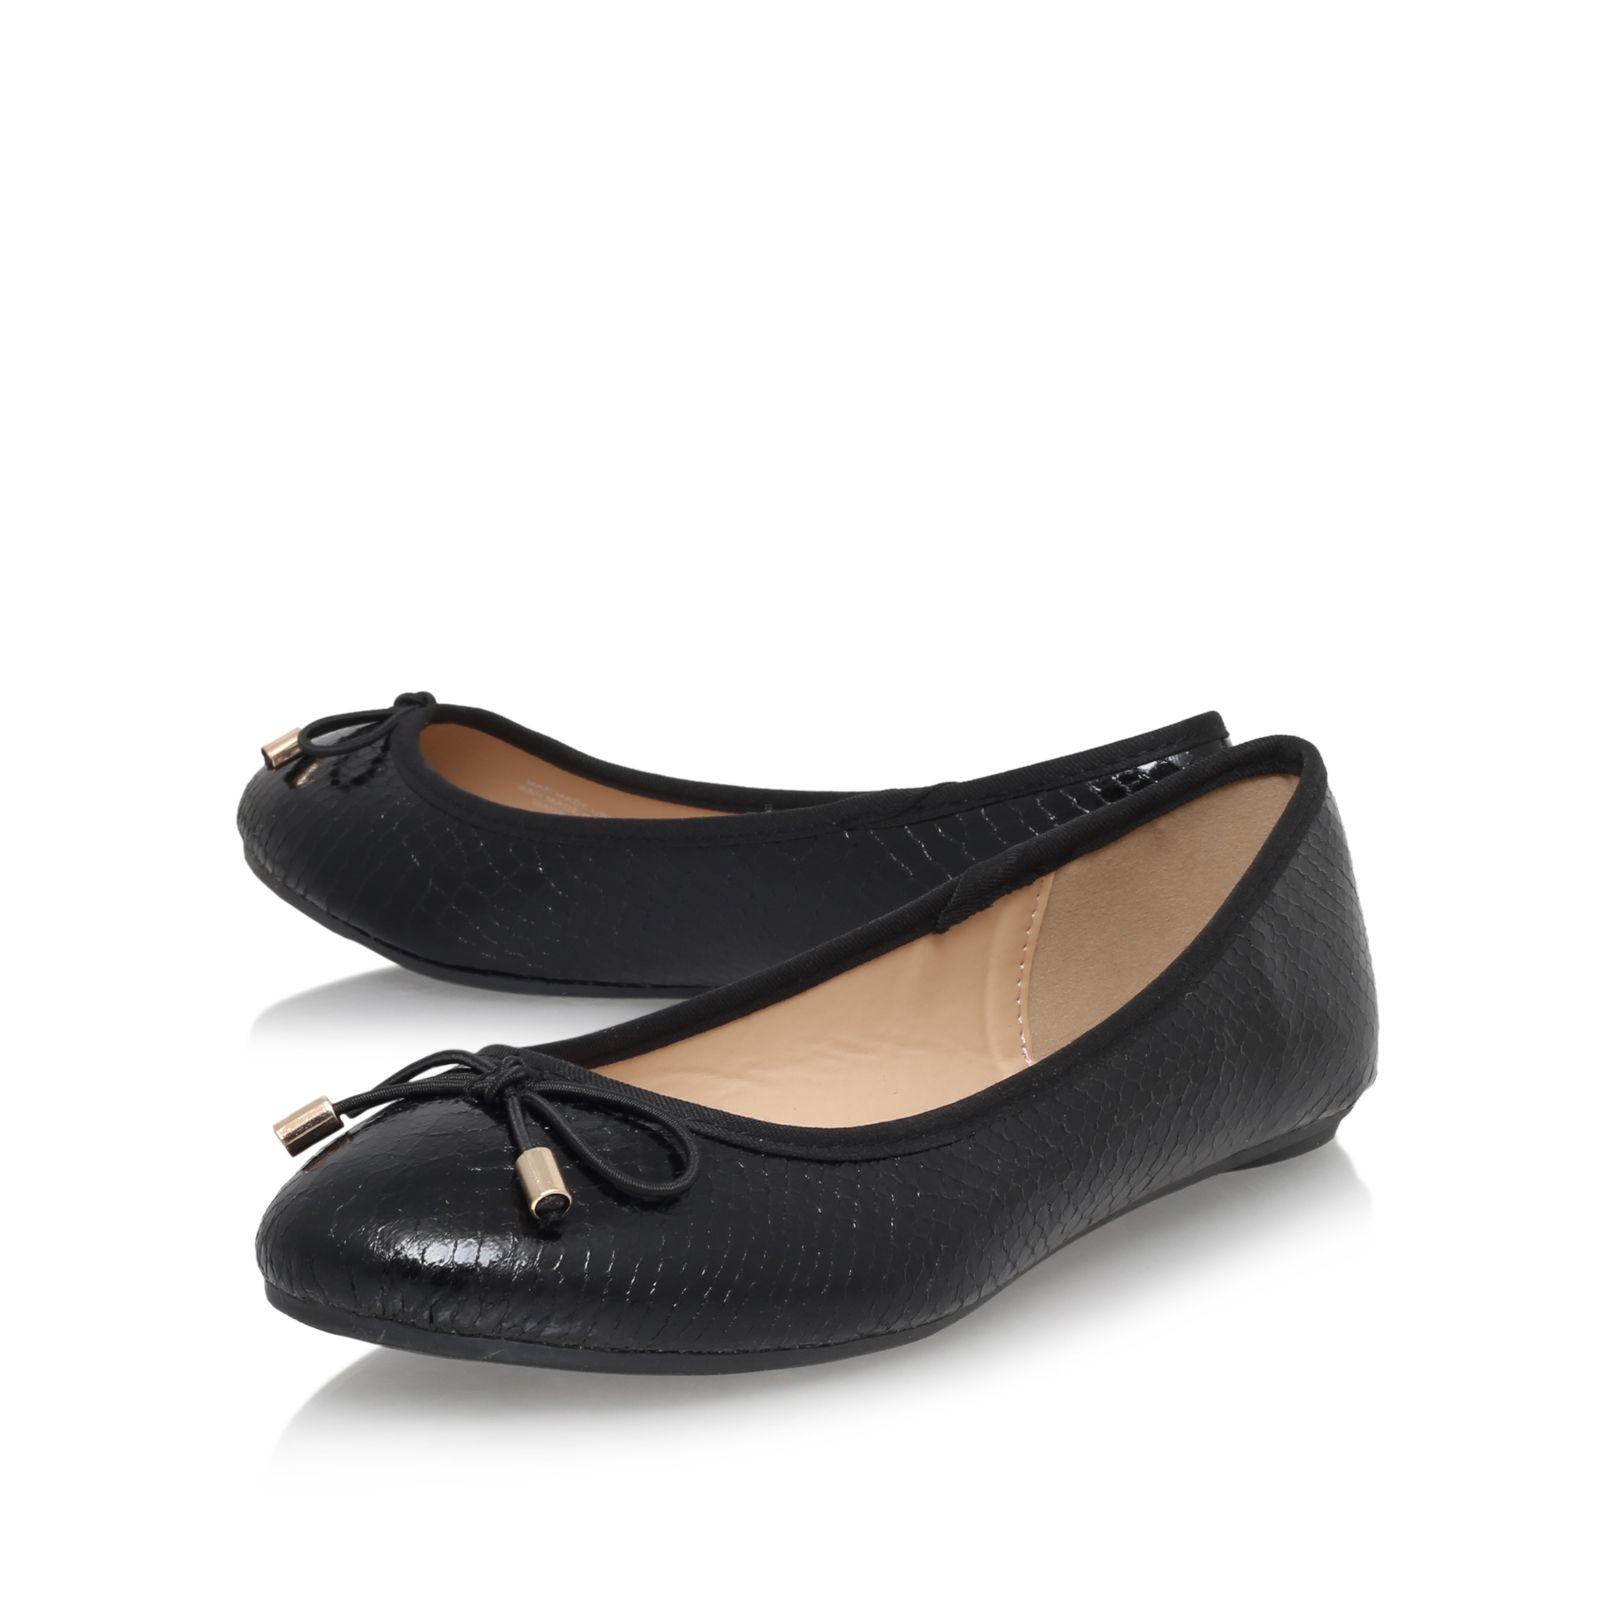 Black Flat Ballerina Shoes Carvela Kurt Geiger